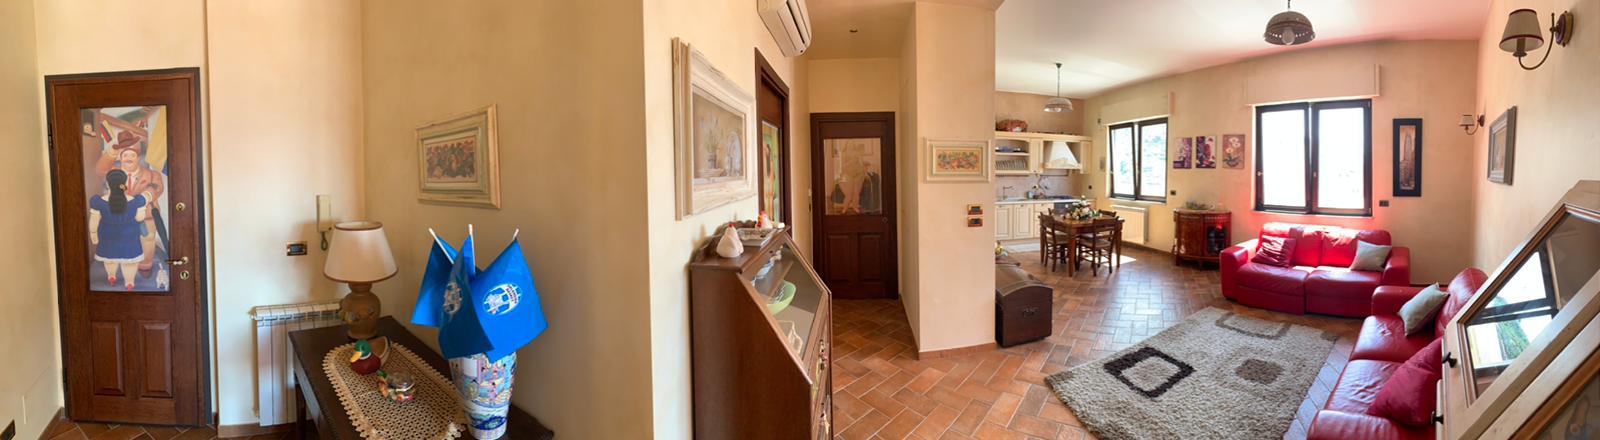 entrata, salone e cucina panoramica